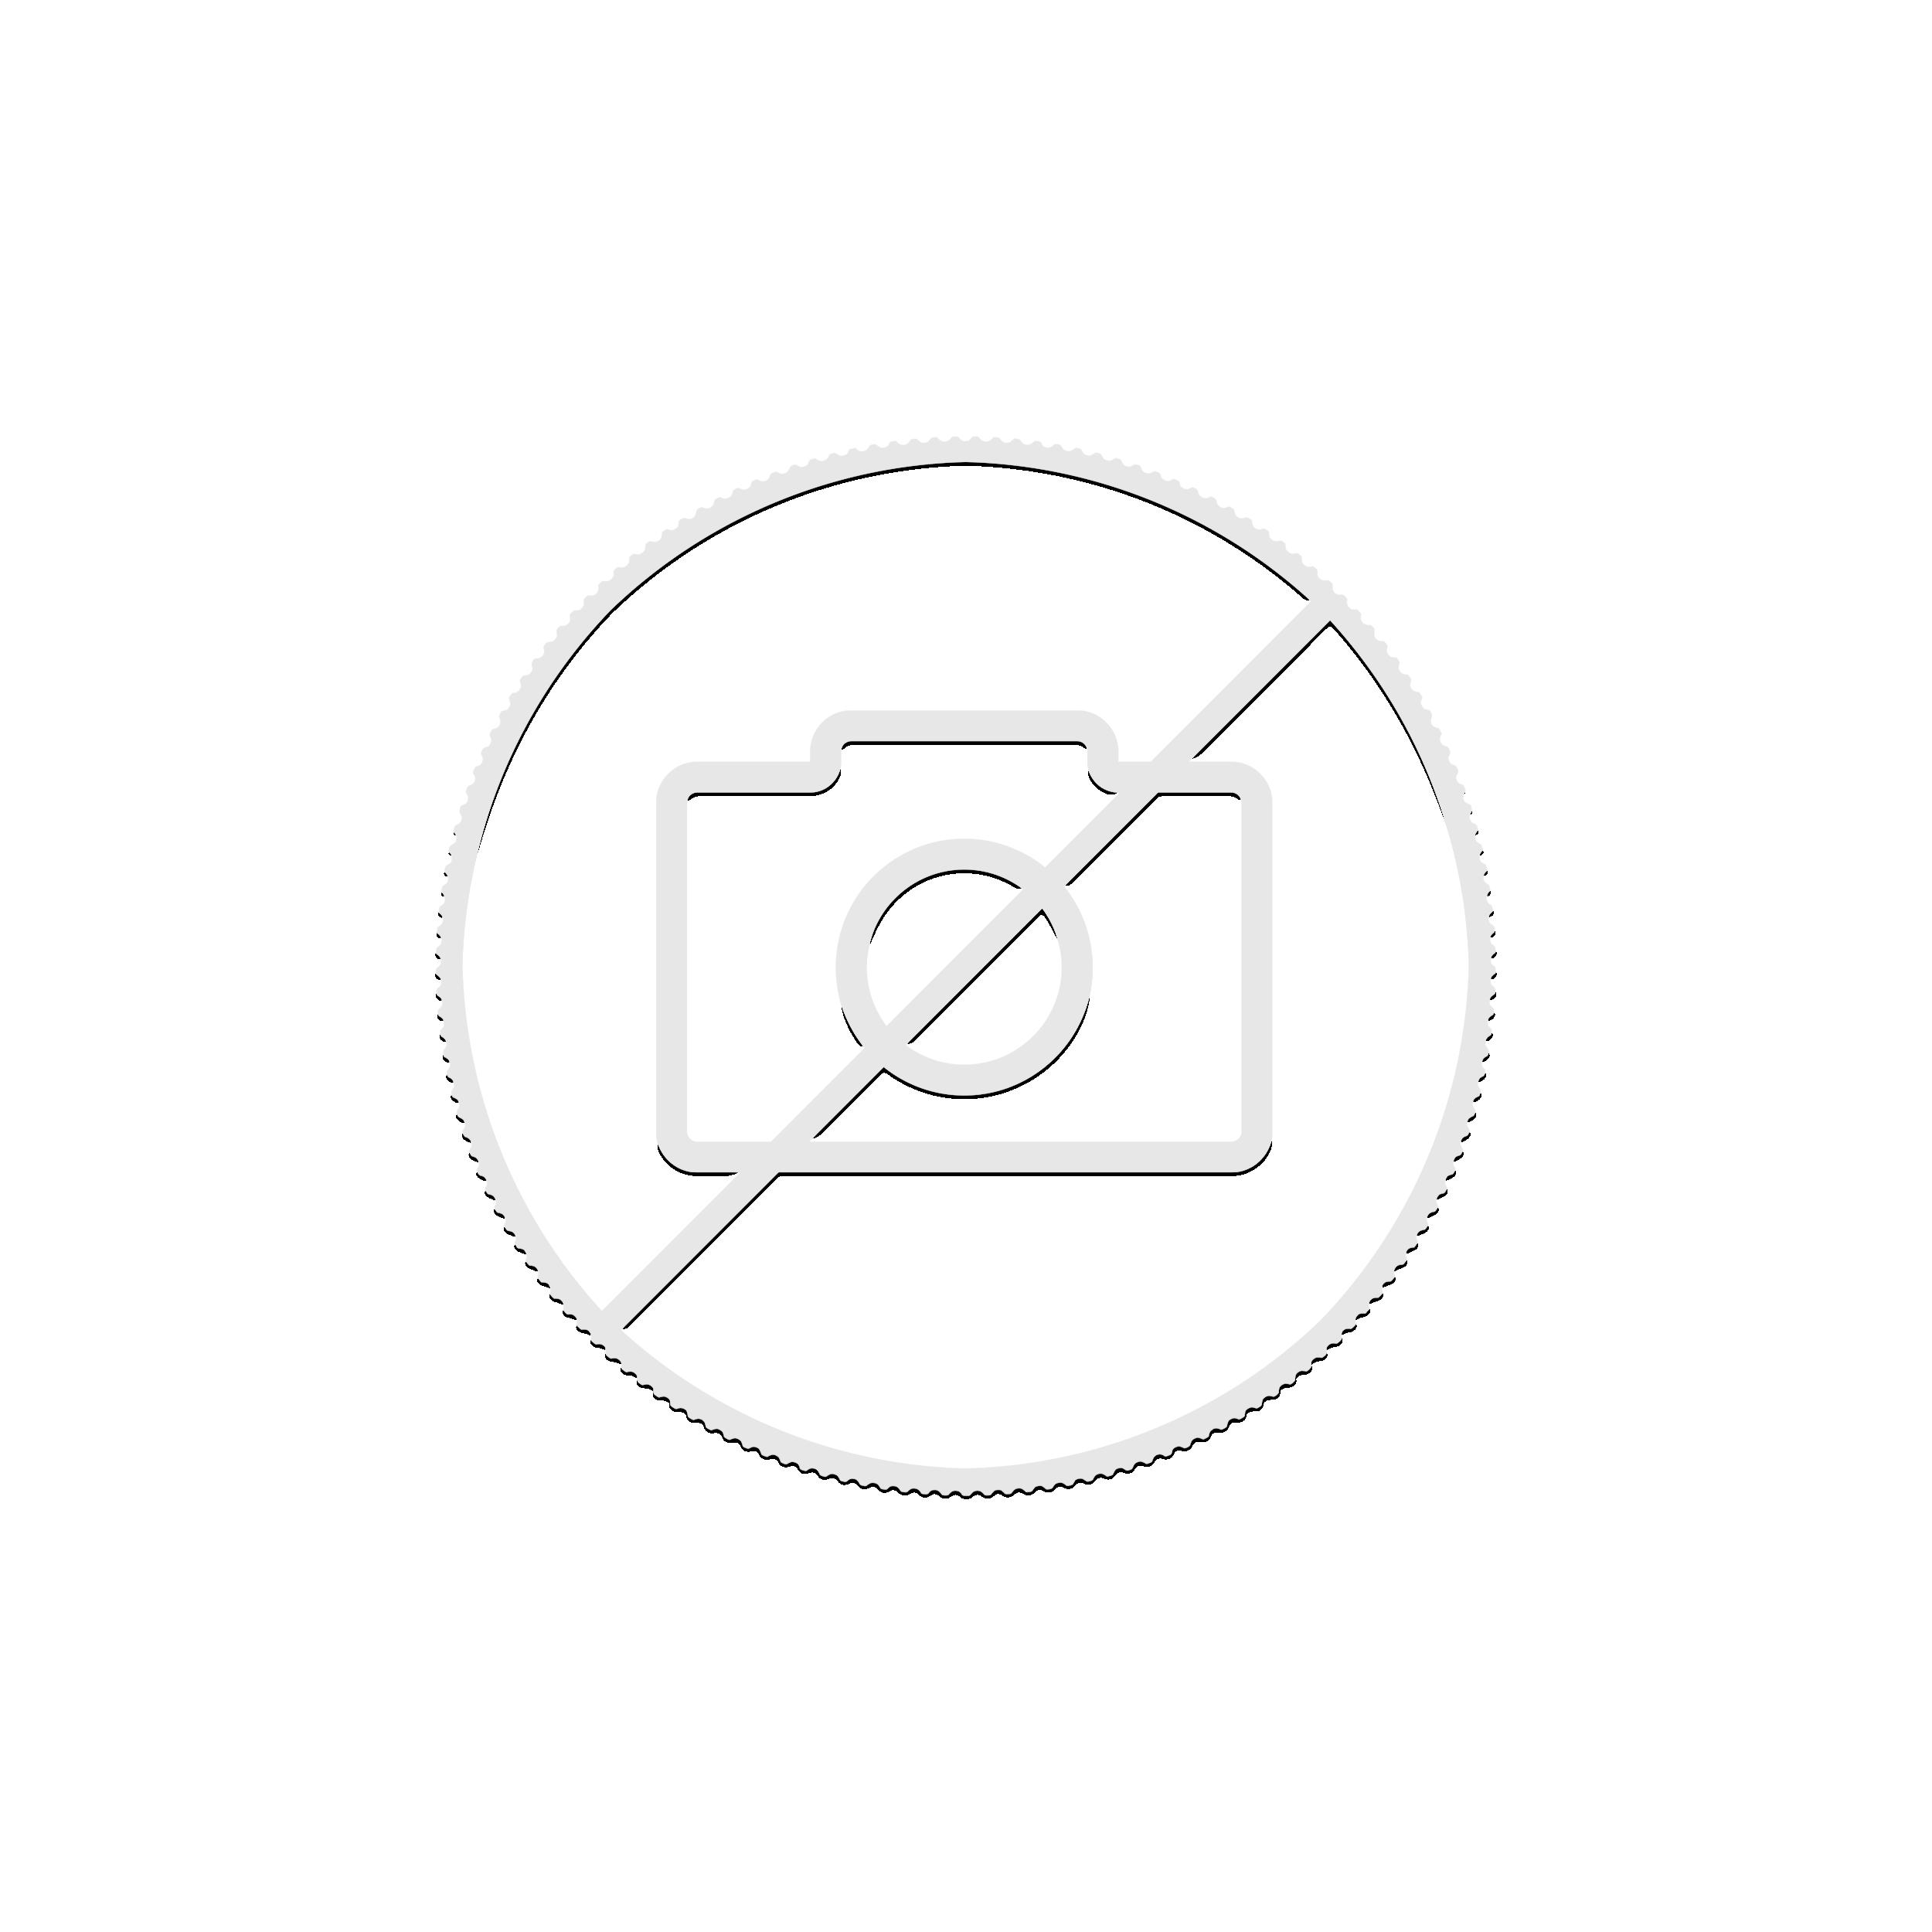 2 troy ounce zilveren munt Phoenix 2018 - box